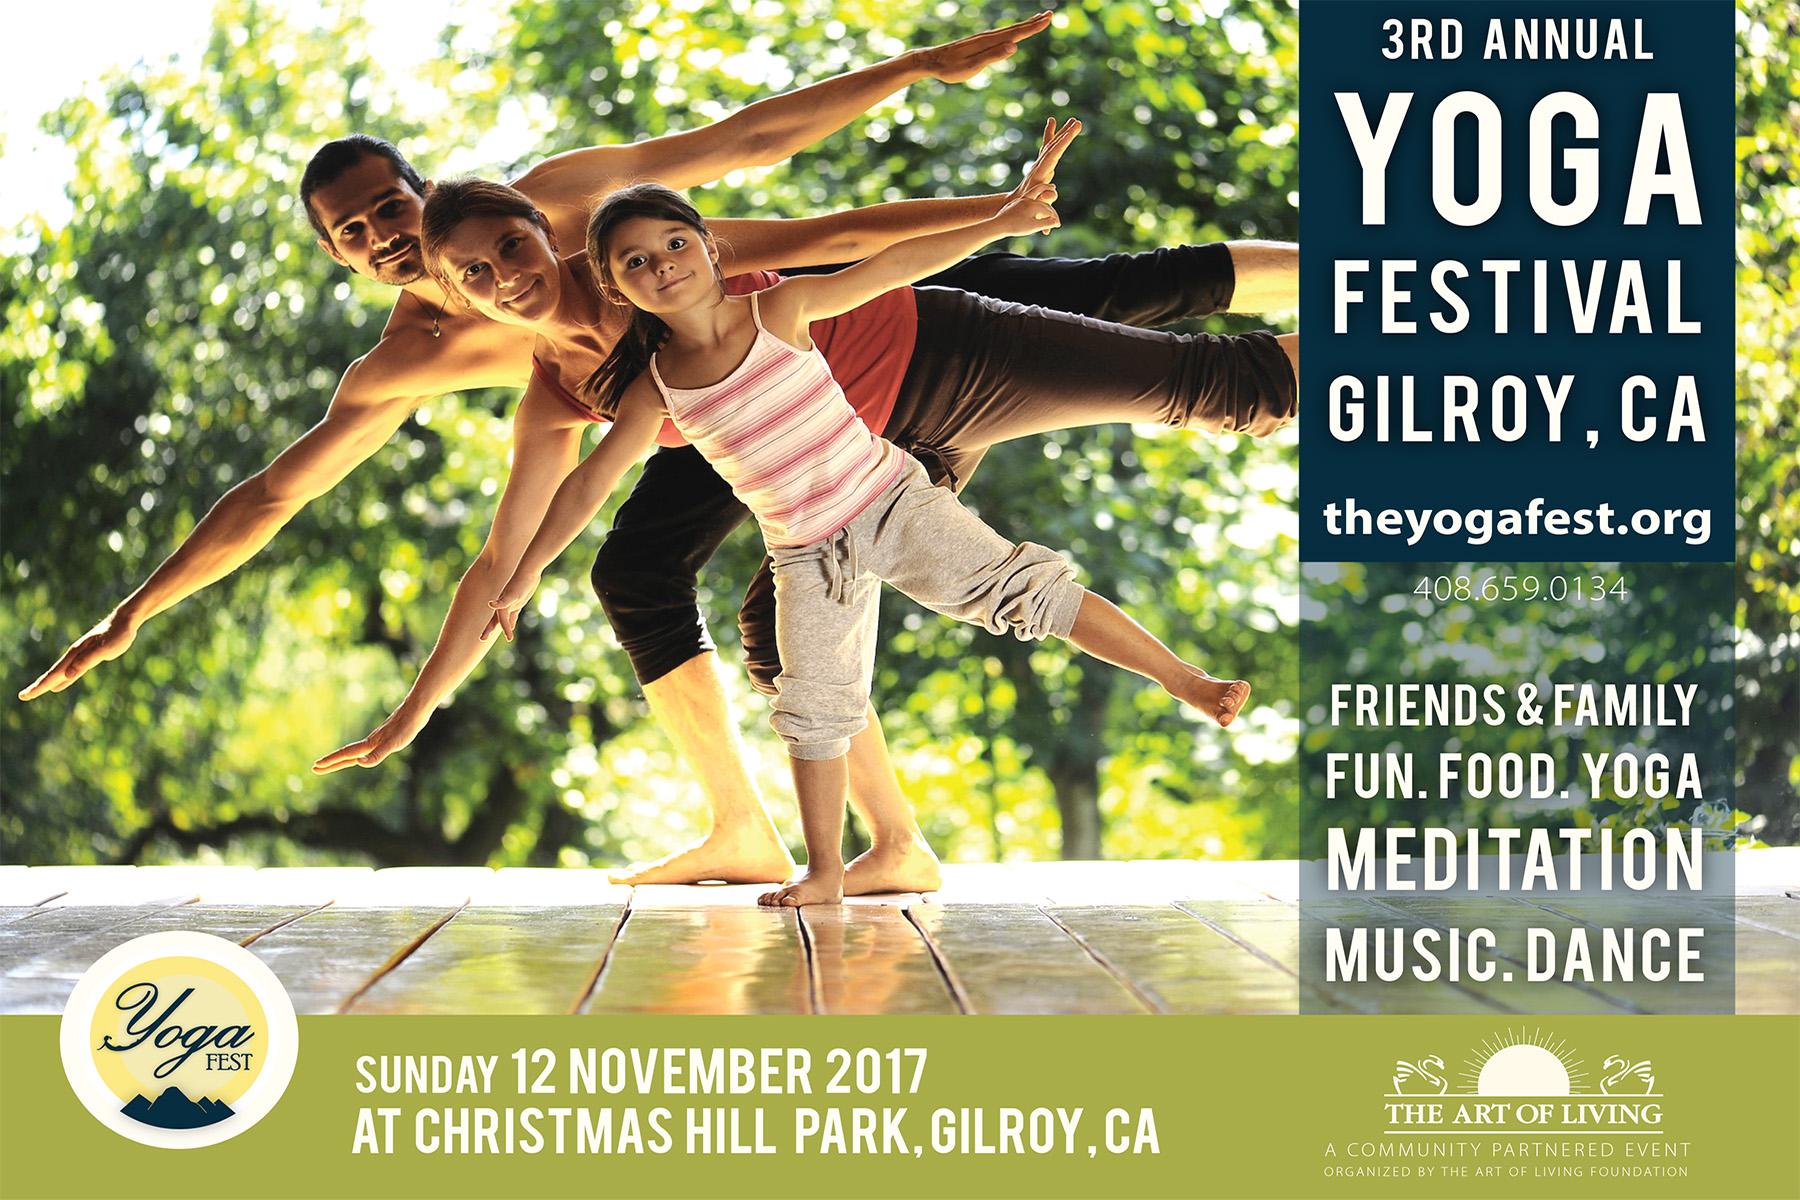 Christmas Hill Park Gilroy Ca 95020.Yogafest 2017 Gilroy Ca Morgan Hill Life